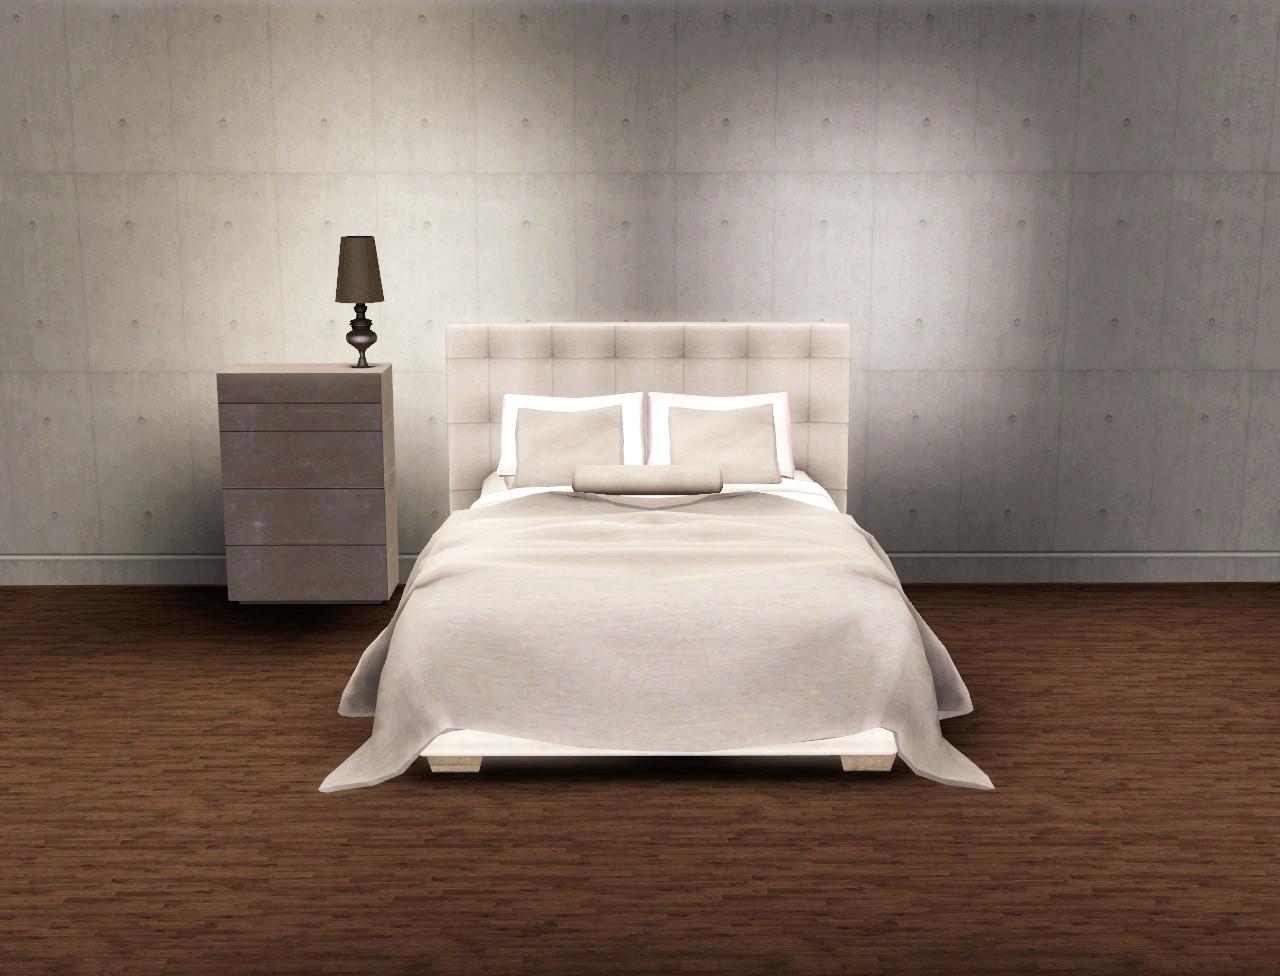 My Sims 3 Blog Paris Quadro Bedroom Set By Esatto Design